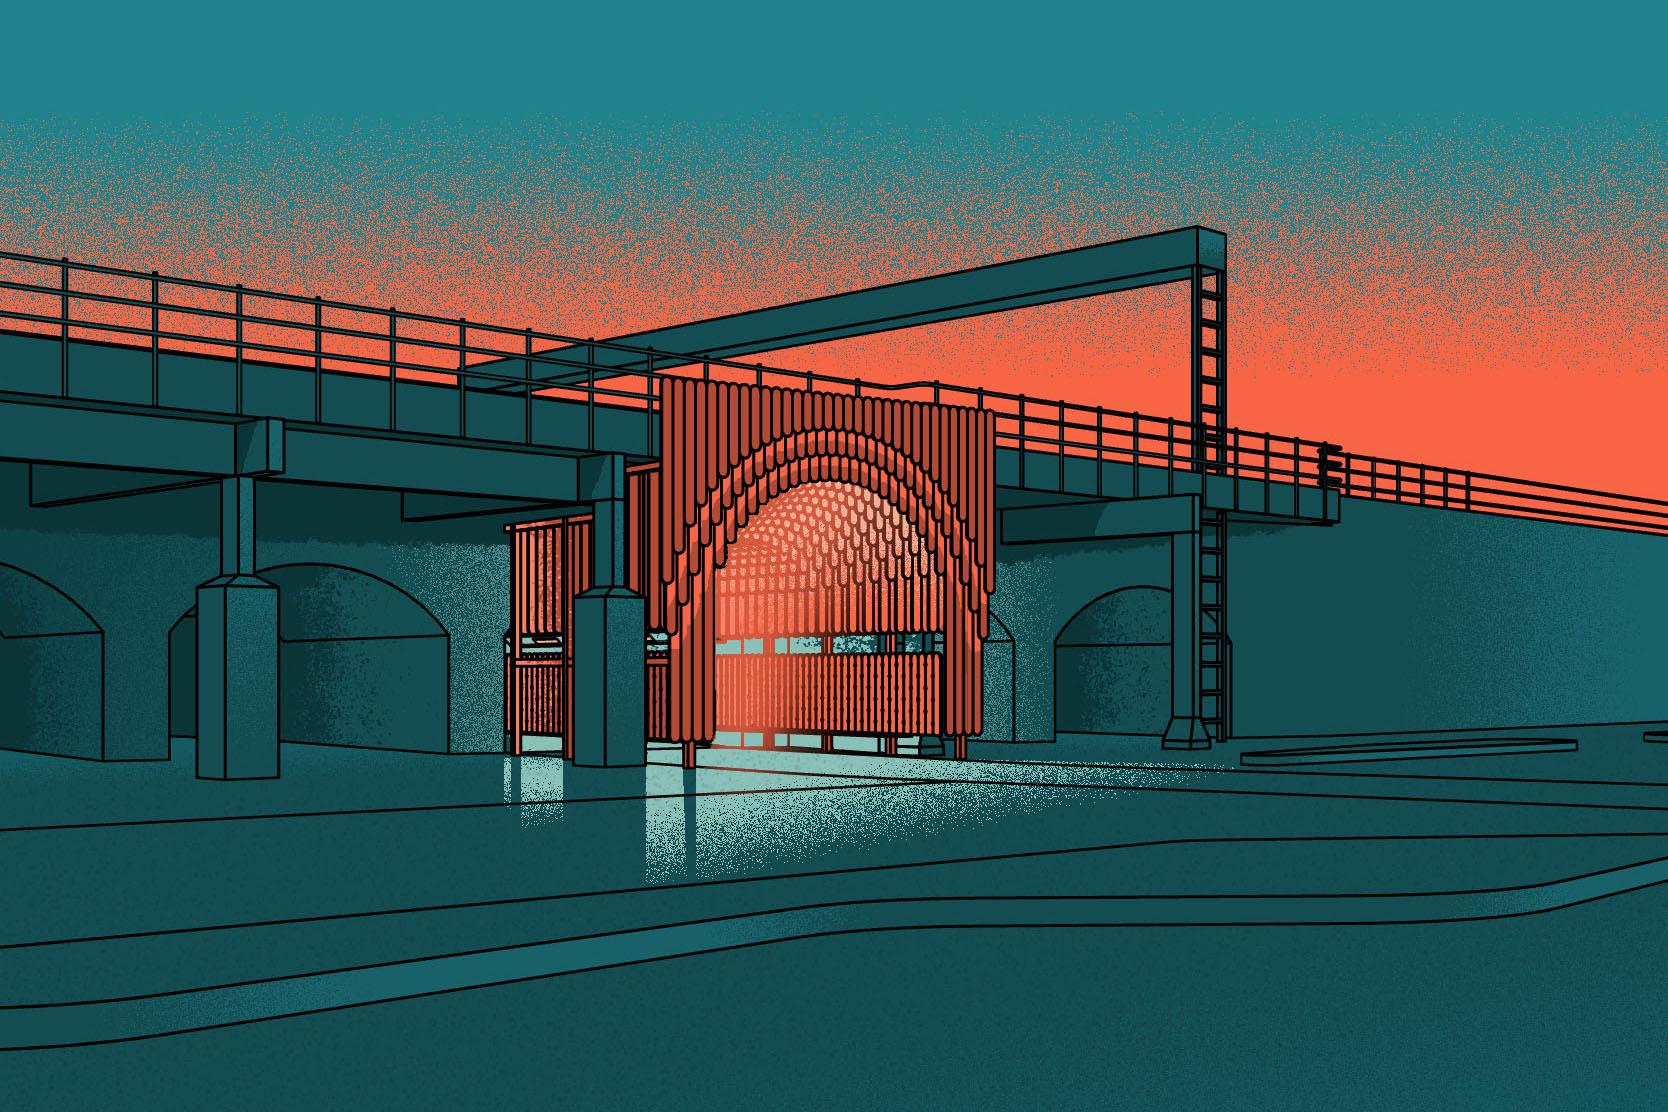 Nine Elms Archways - Nighttime View